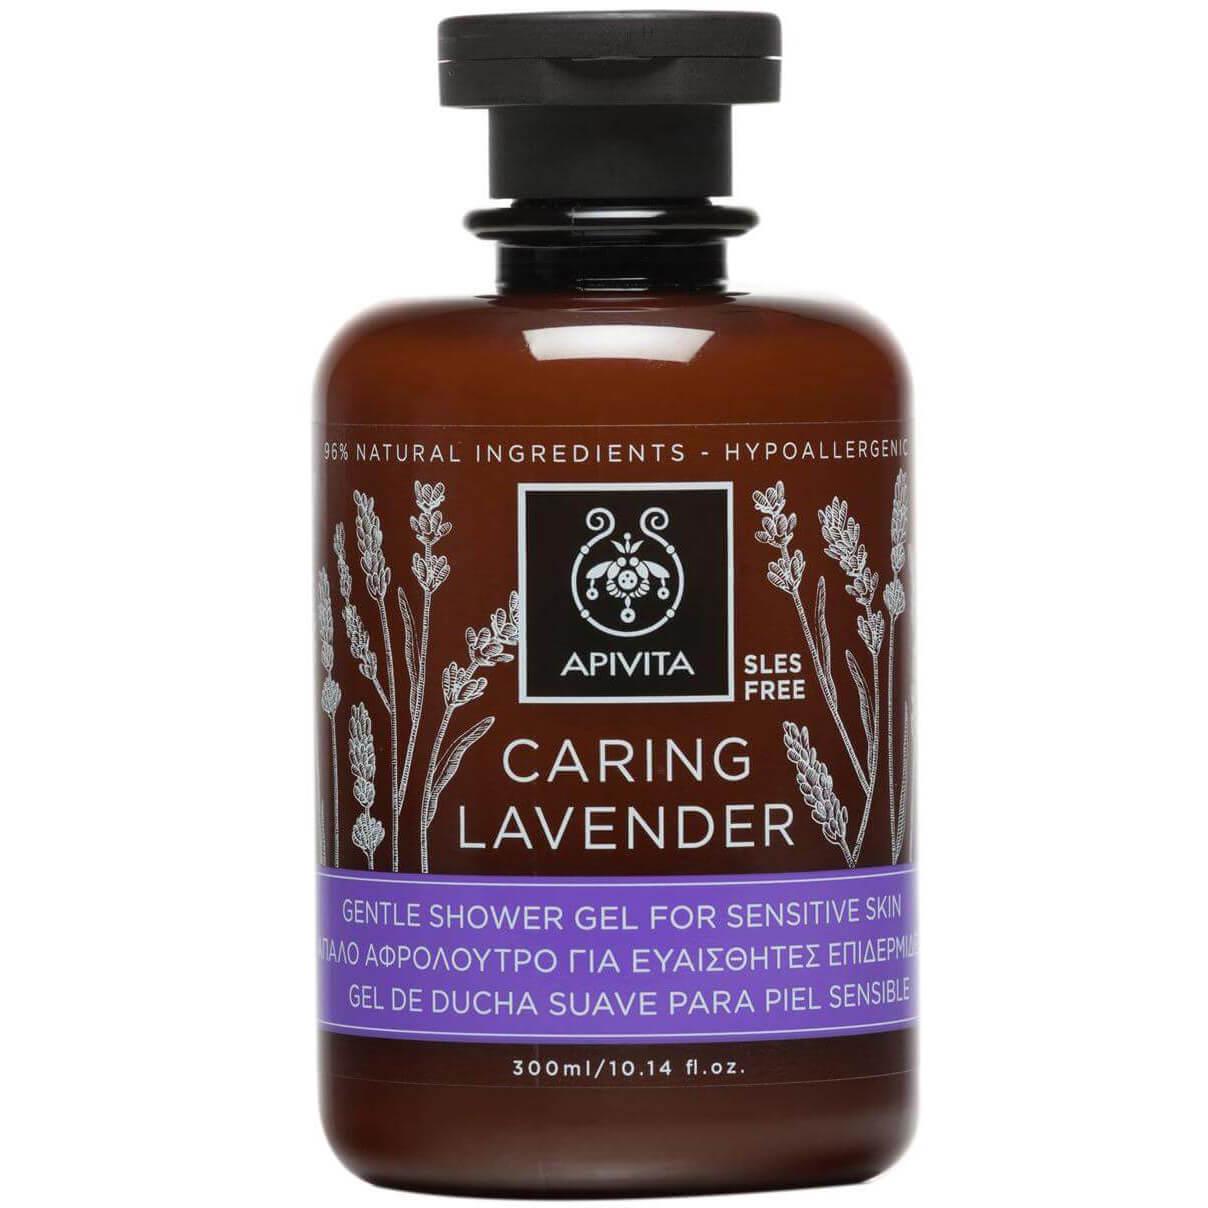 Apivita Caring Lavender Shower Gel Χαλαρωτικό Αφρόλουτρο για Ευαίσθητες Επιδερμίδες με Βιολογικό Αιθέριο Έλαιο Λεβάντας 300ml